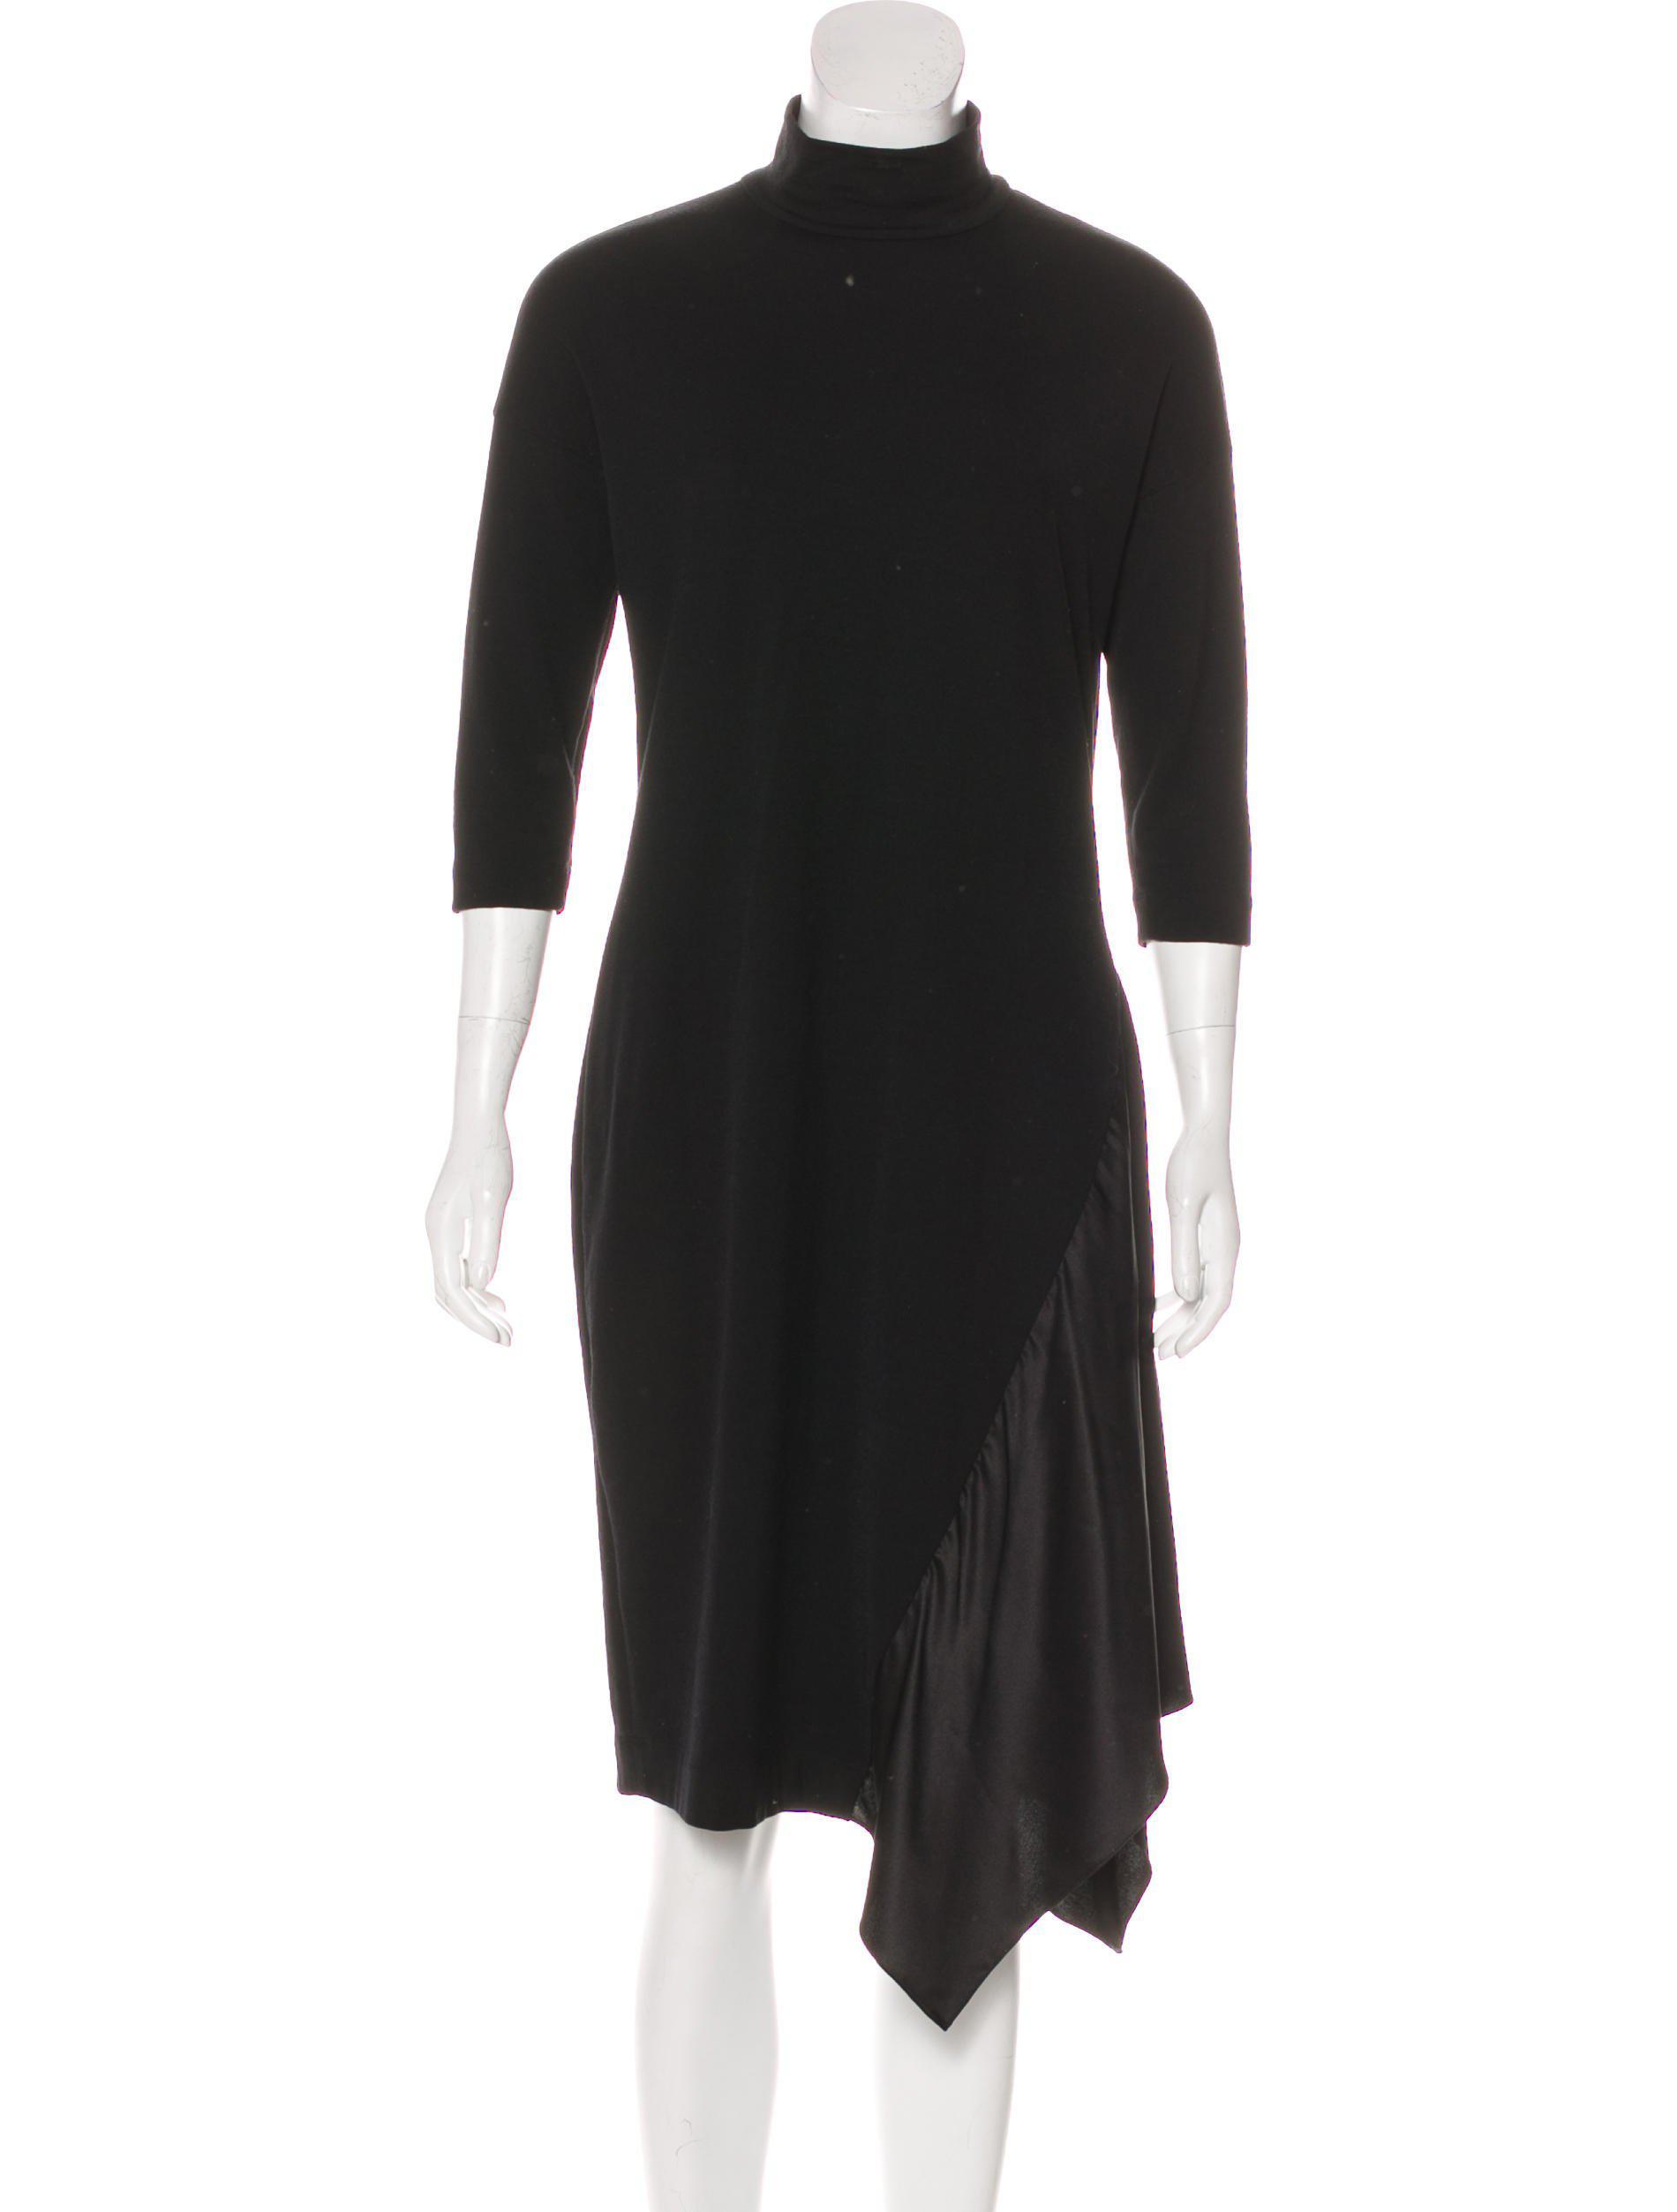 35c0edd27677c Lyst - Brunello Cucinelli Long Sleeve Midi Dress in Black